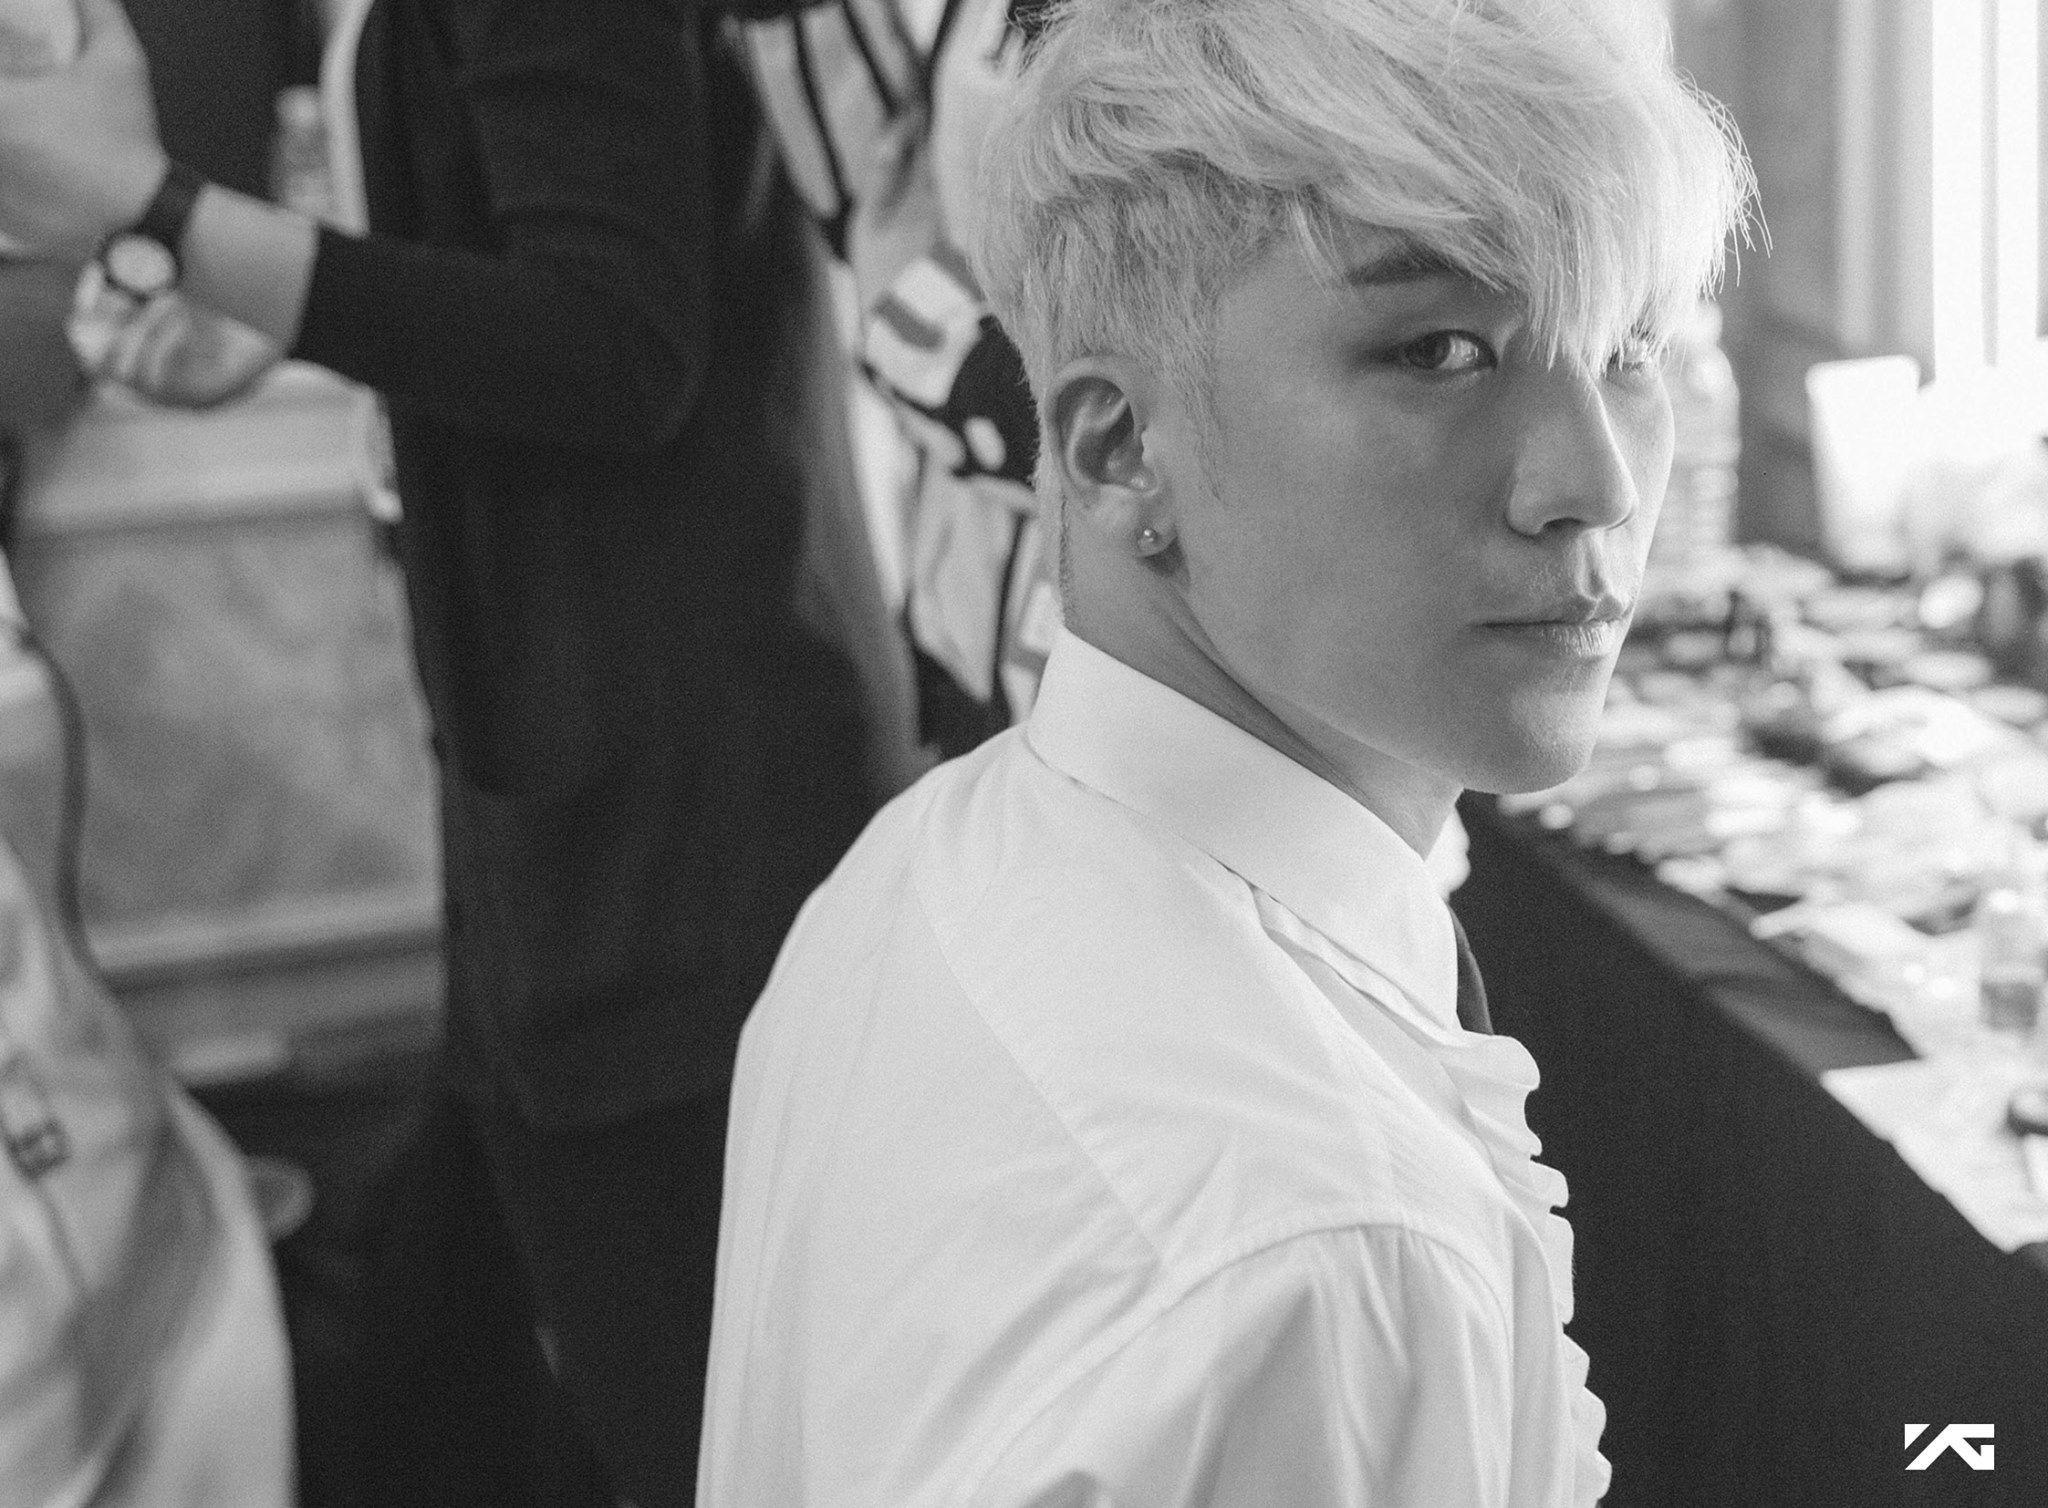 Image: BIGBANG's Facebook / YG Entertainment